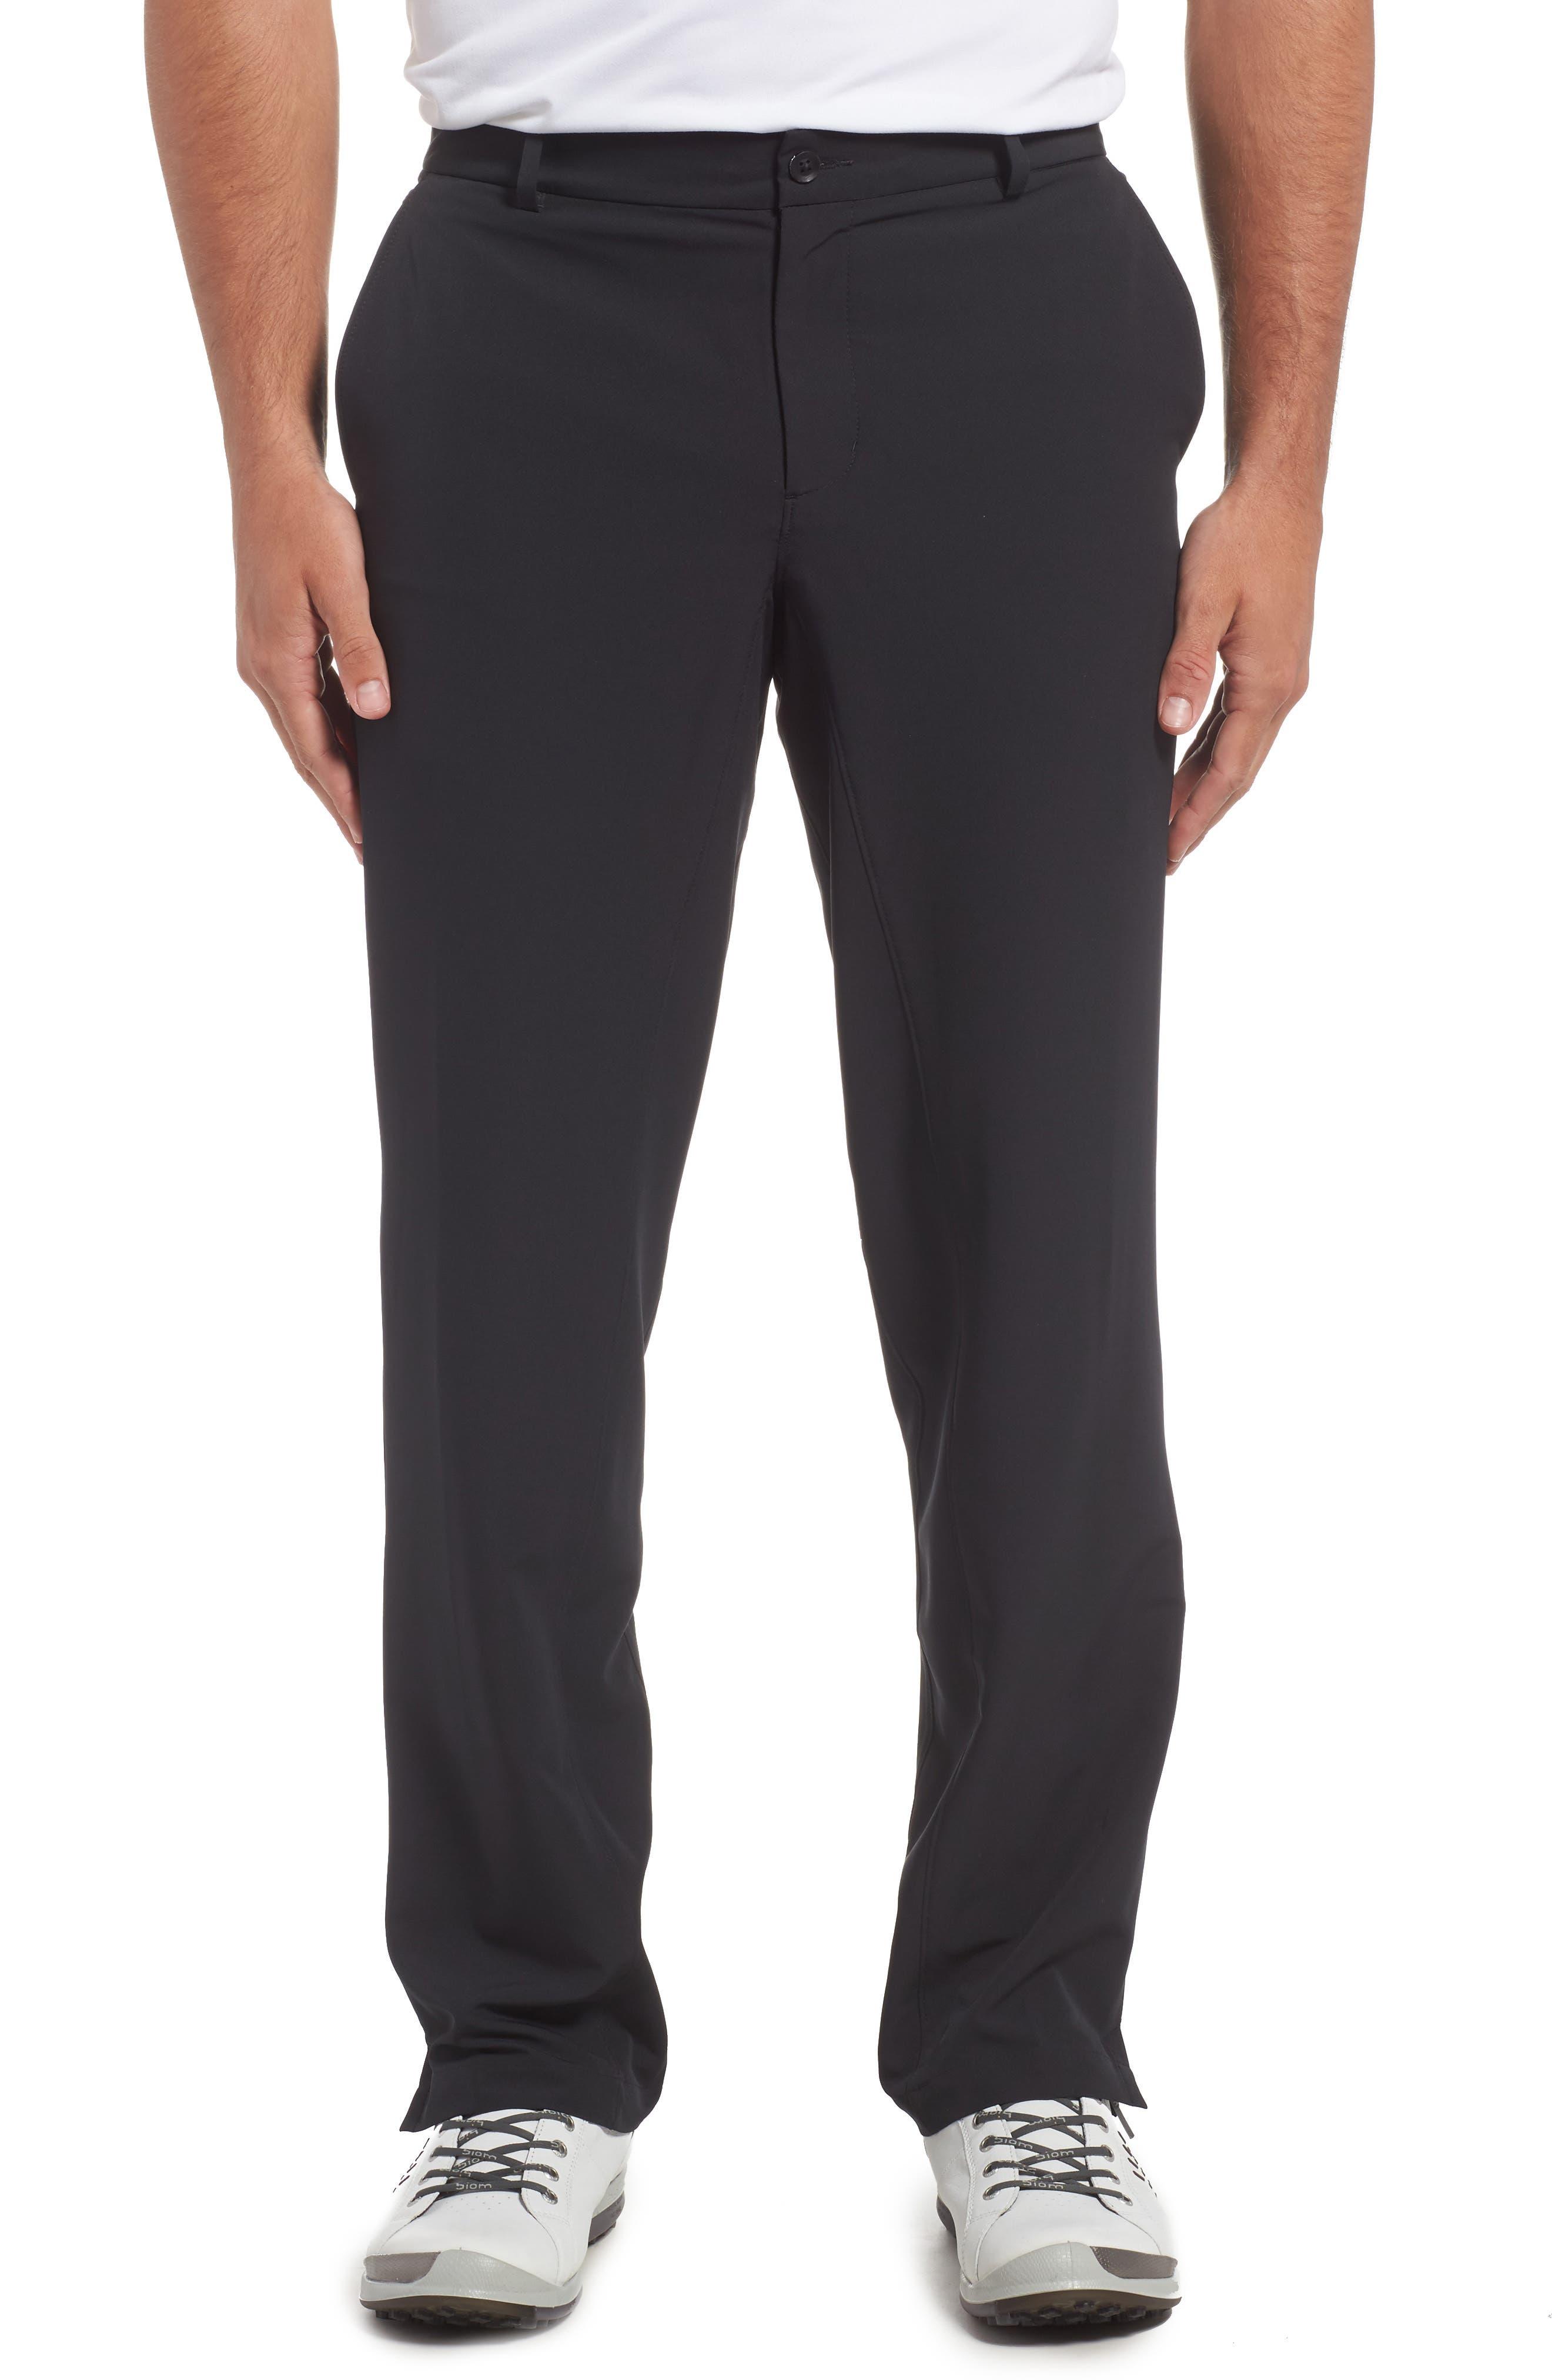 NIKE, Hybrid Flex Golf Pants, Main thumbnail 1, color, 010